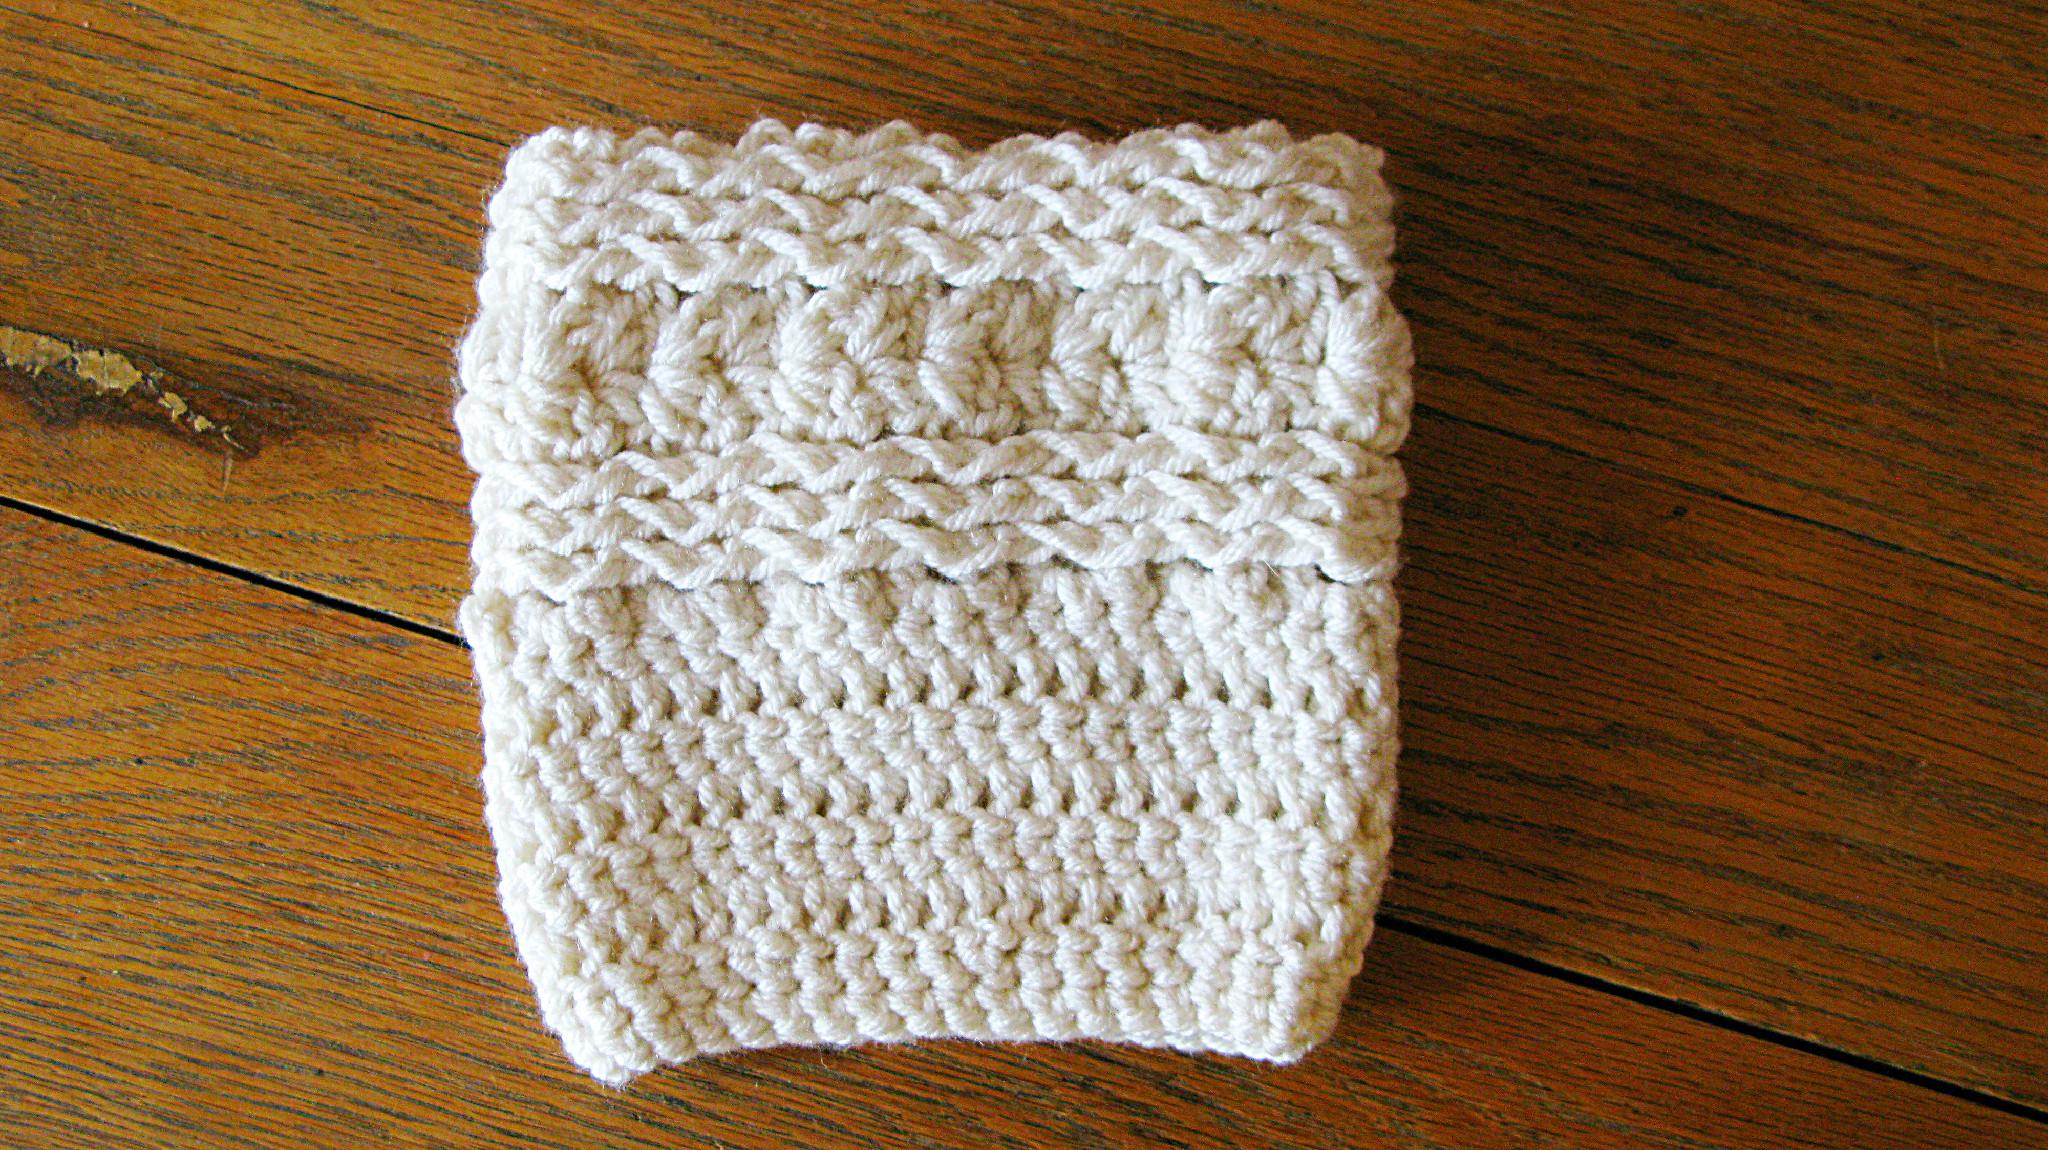 39 All Free Crochet Boot Cuffs Patterns - Patterns Hub